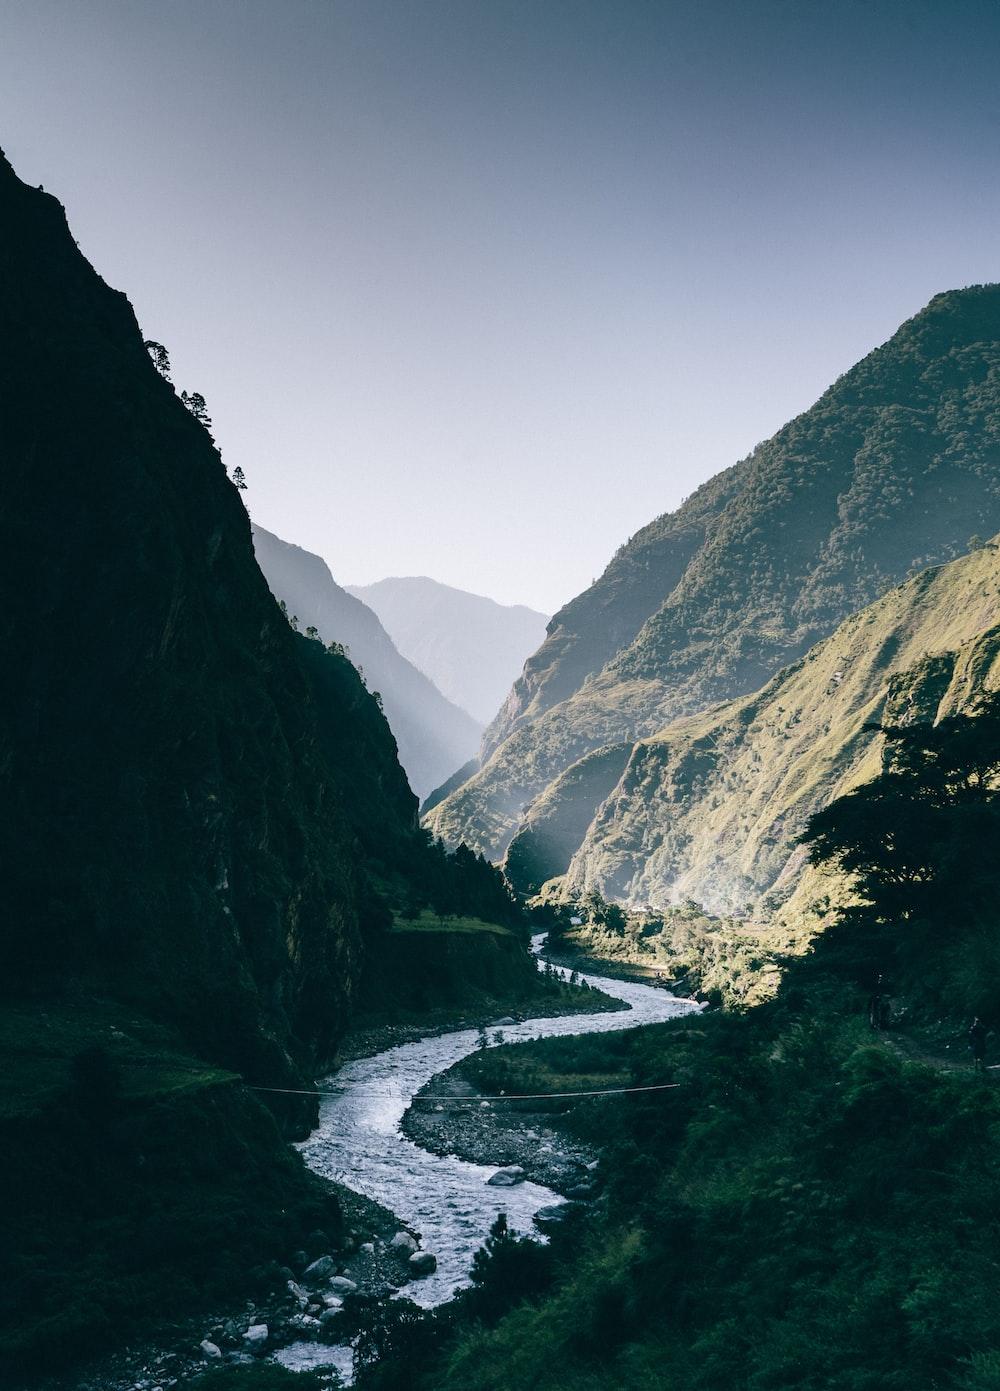 river between mountain at daytime